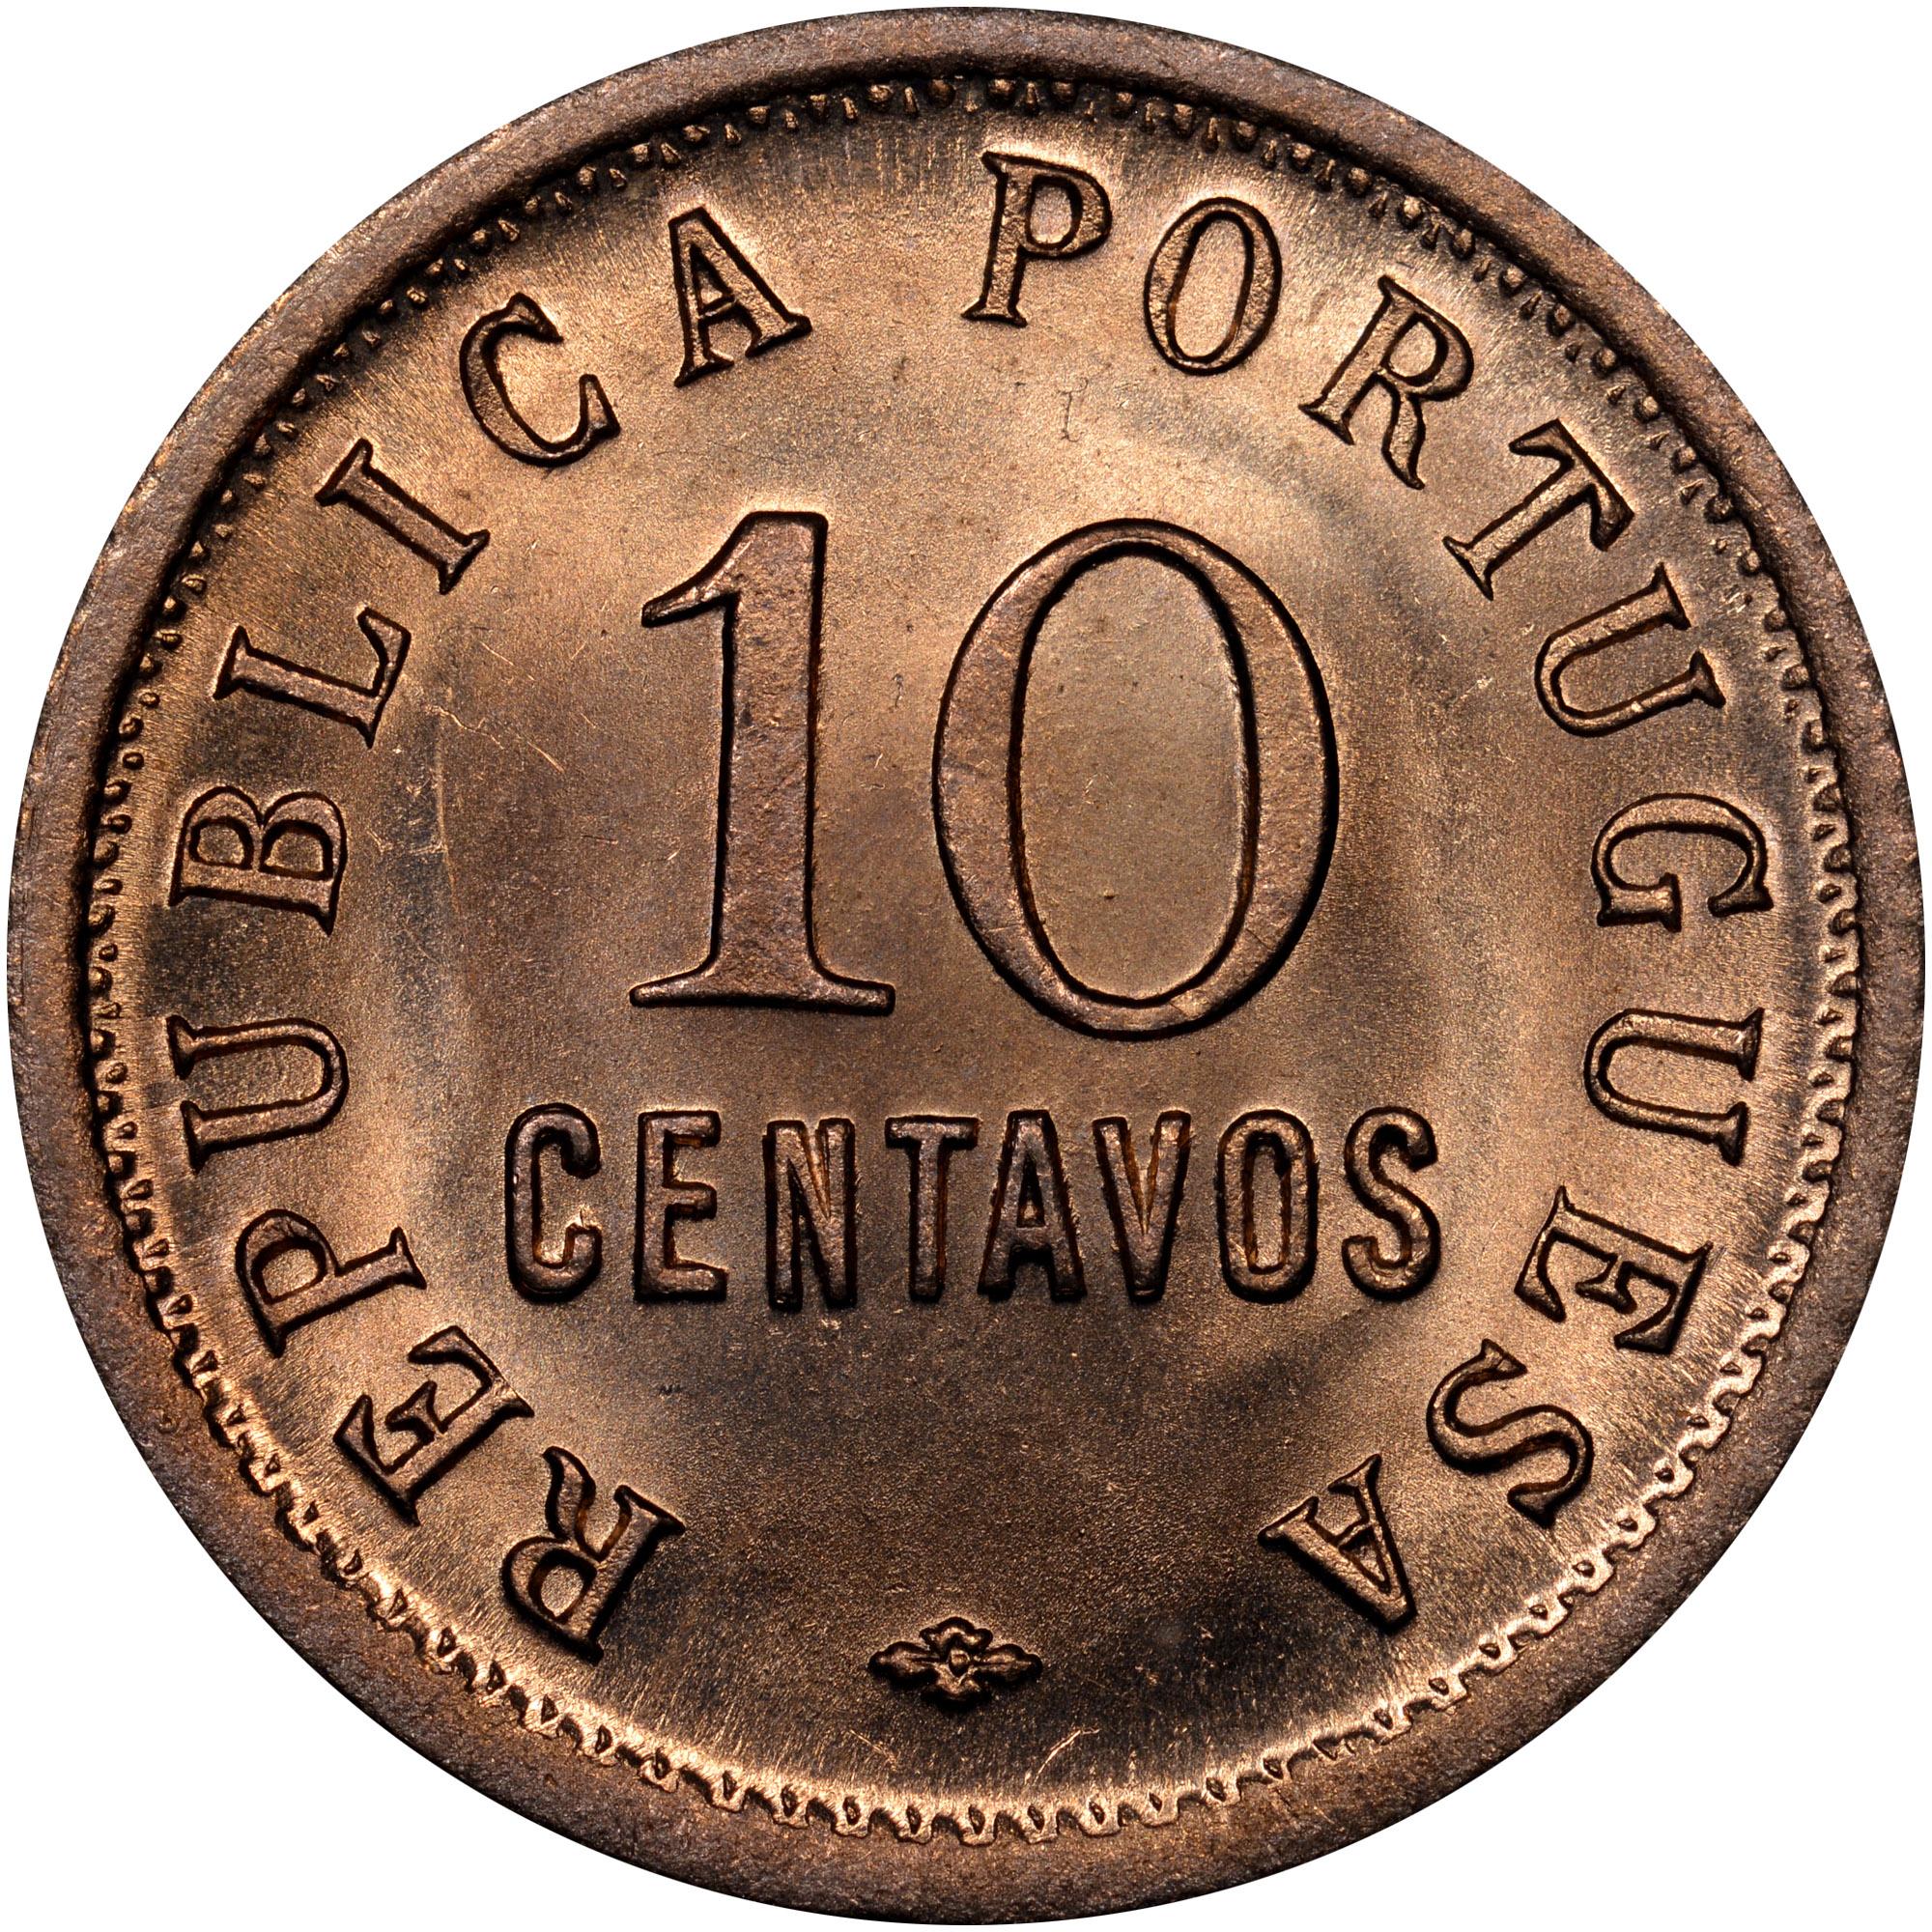 1921-1923 Angola 10 Centavos obverse